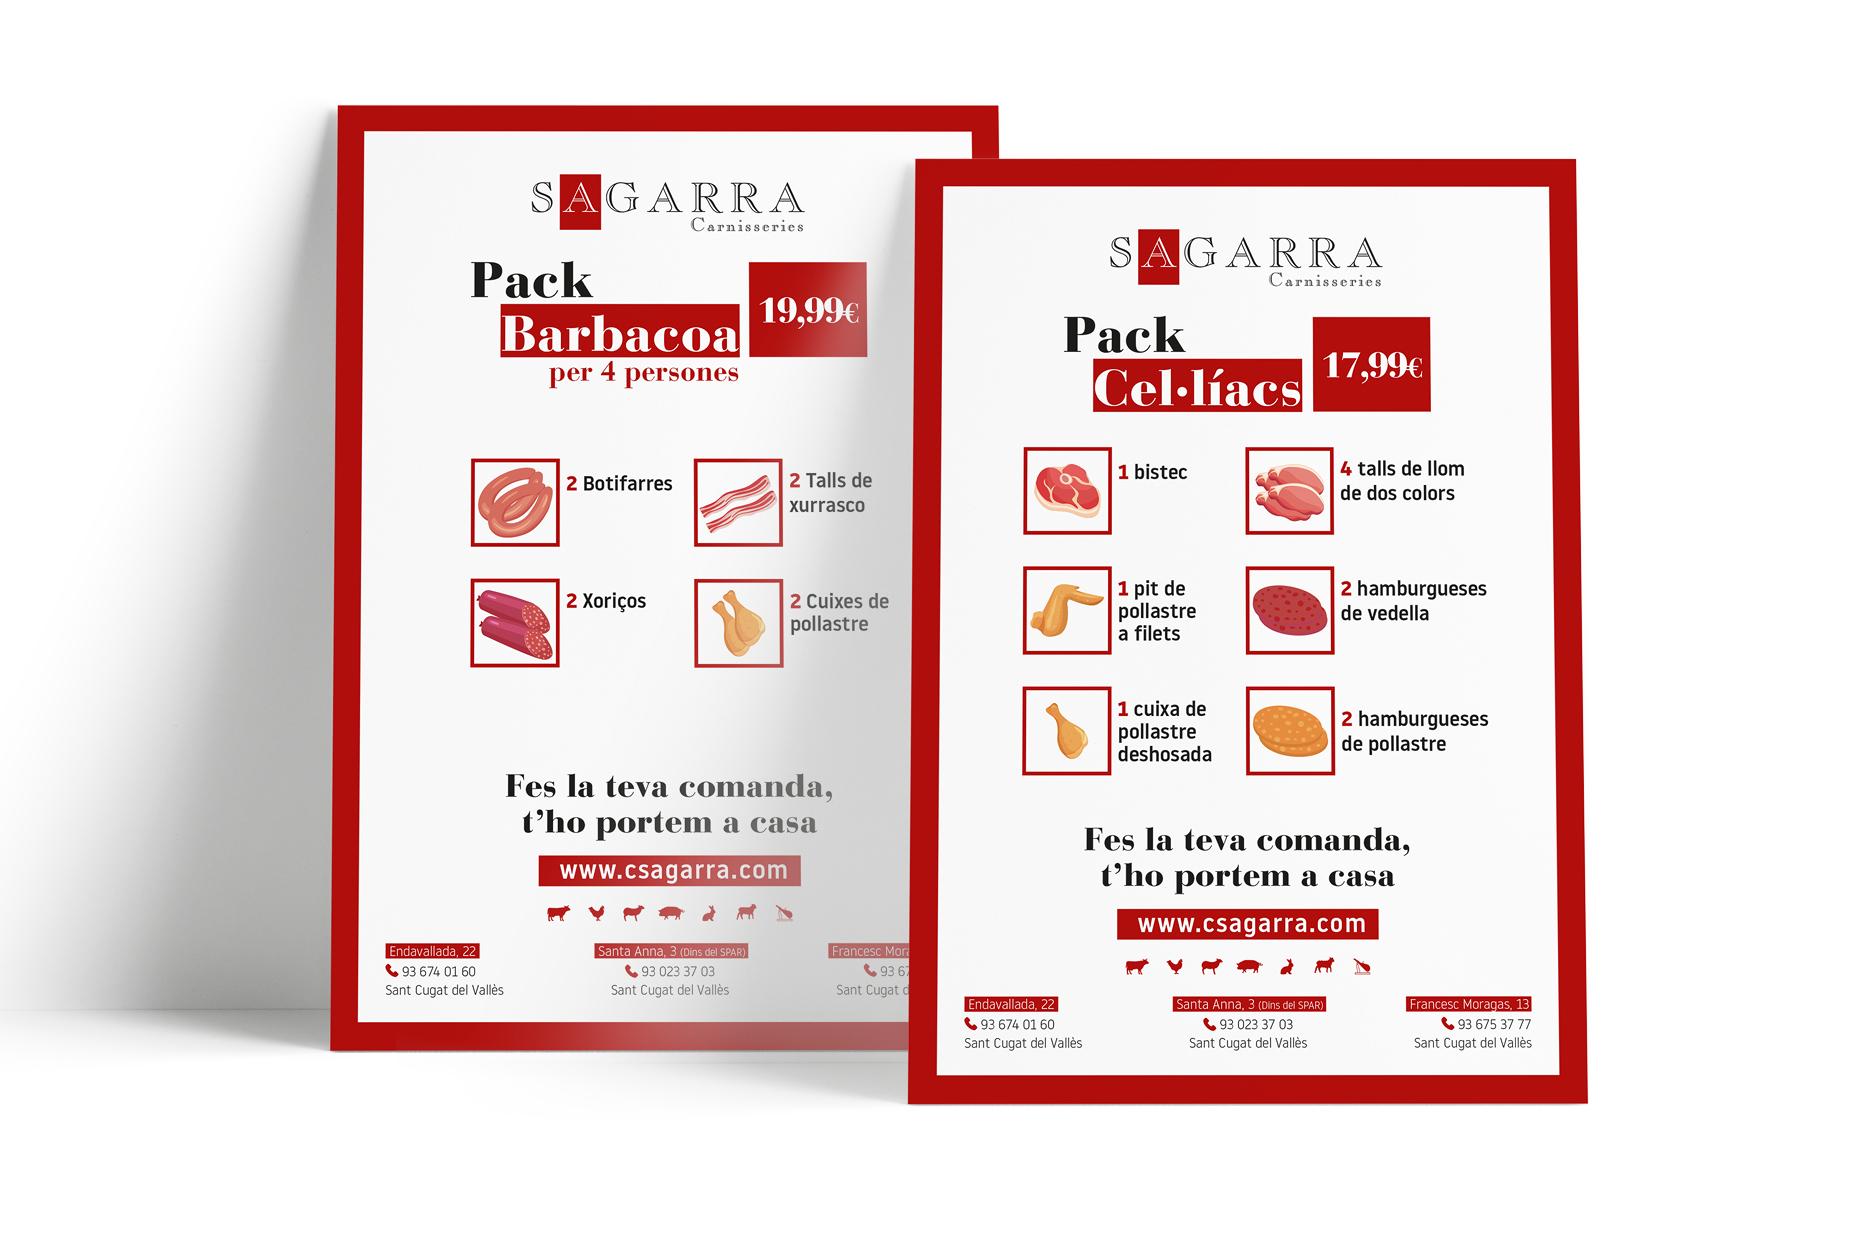 Carnisseria Sagarra_web3.jpg